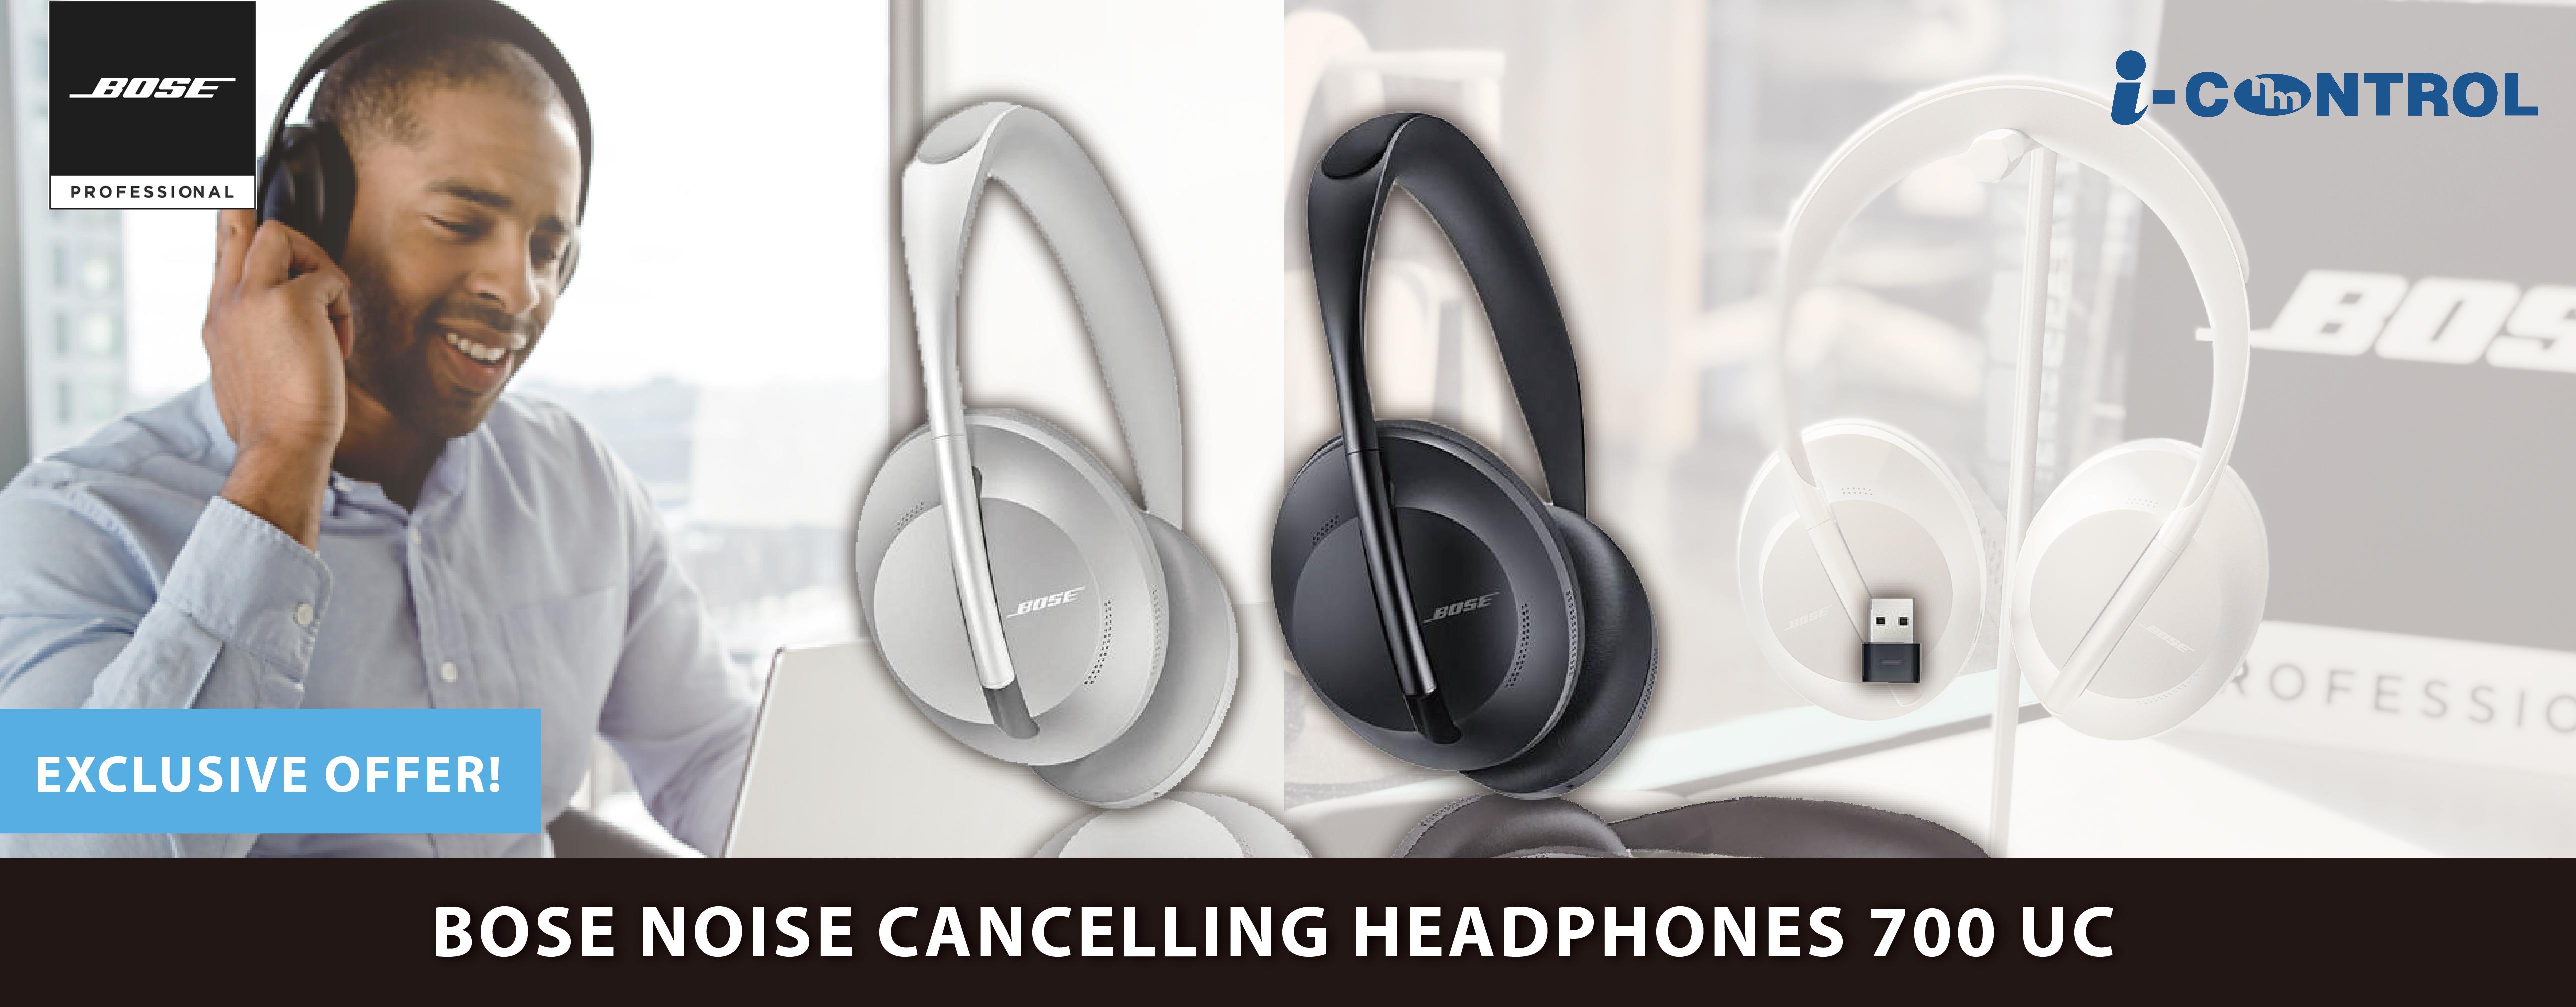 IC_BOSE-Noise-Cancelling-700UC_Web-banner